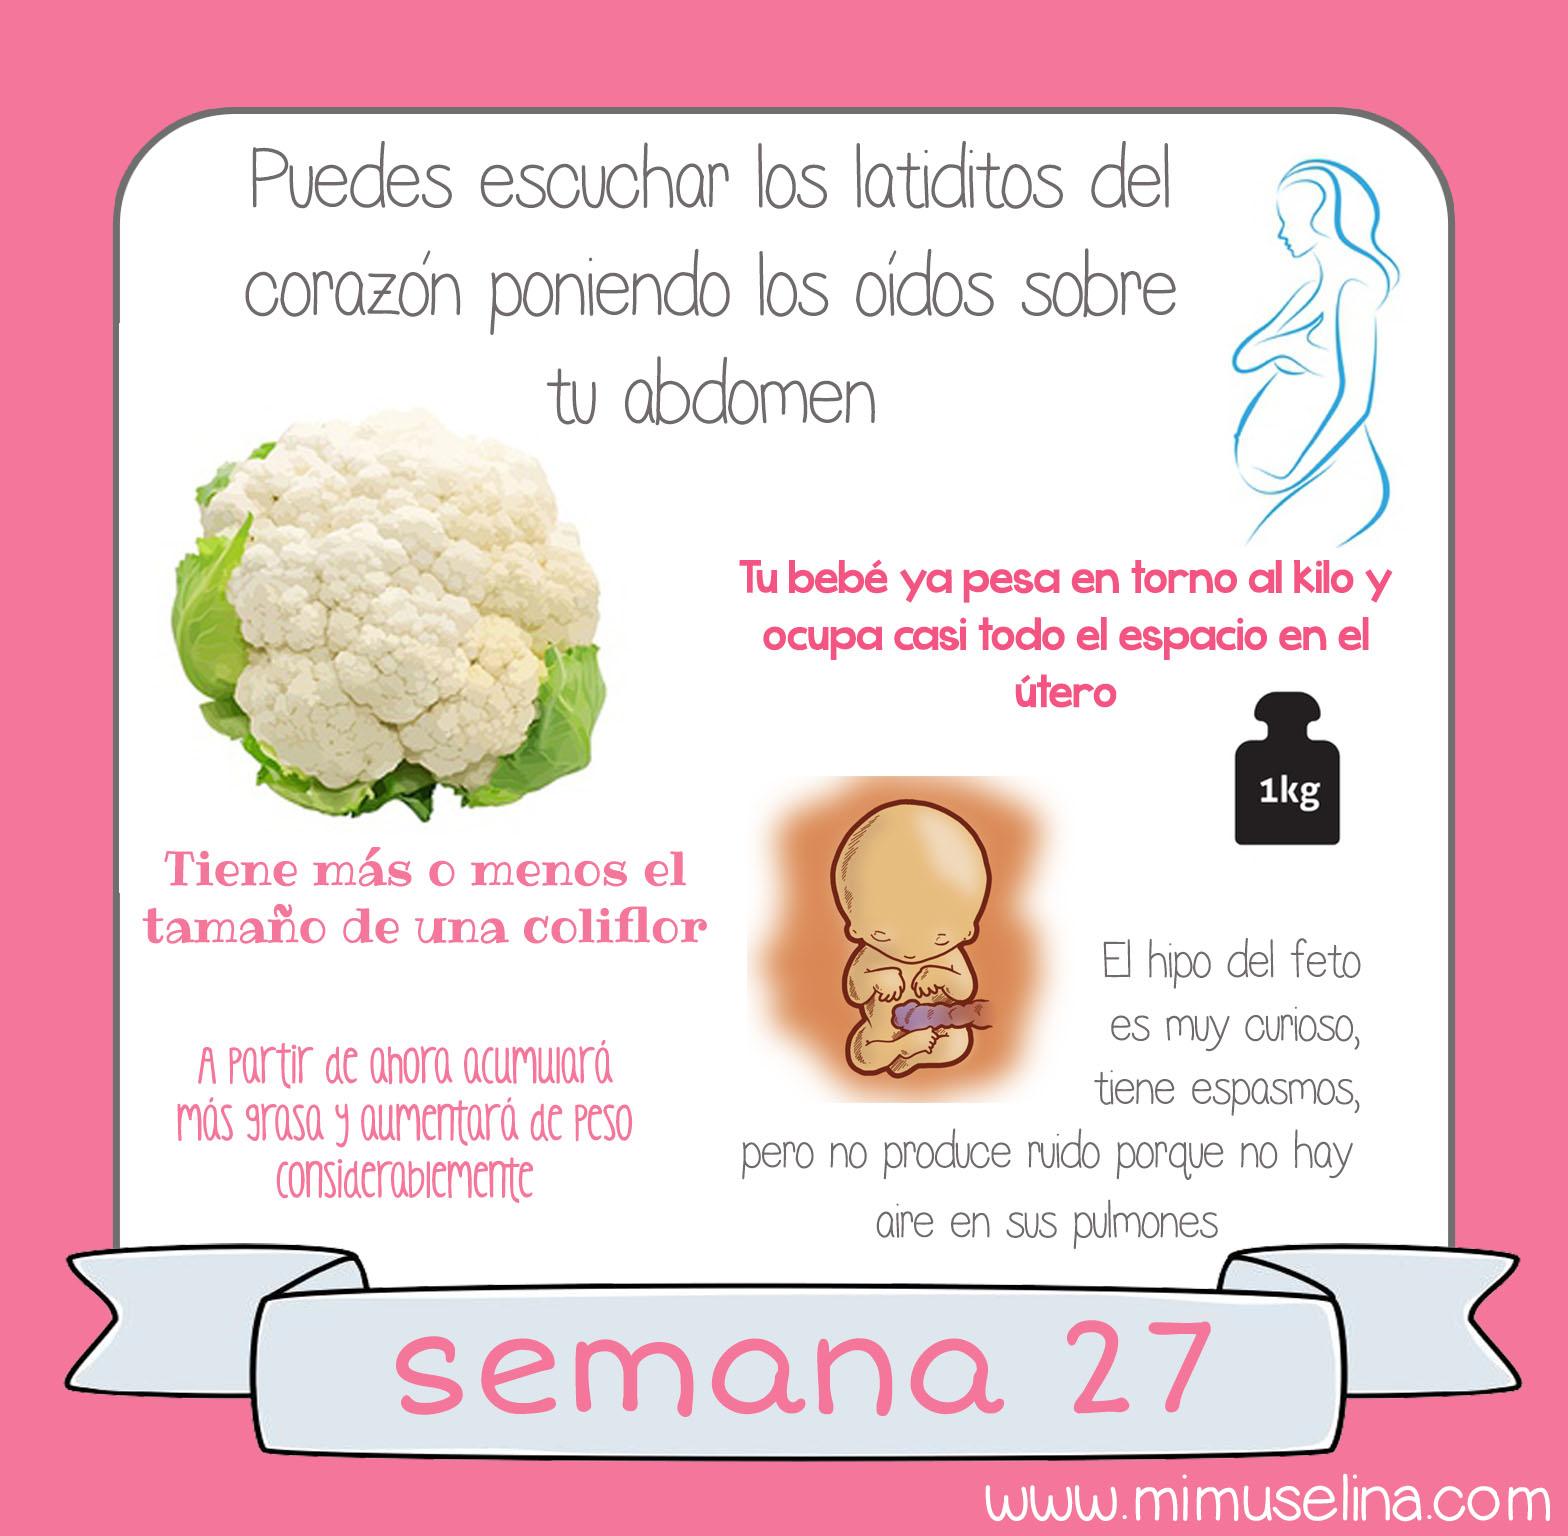 Peso embarazo semana 27